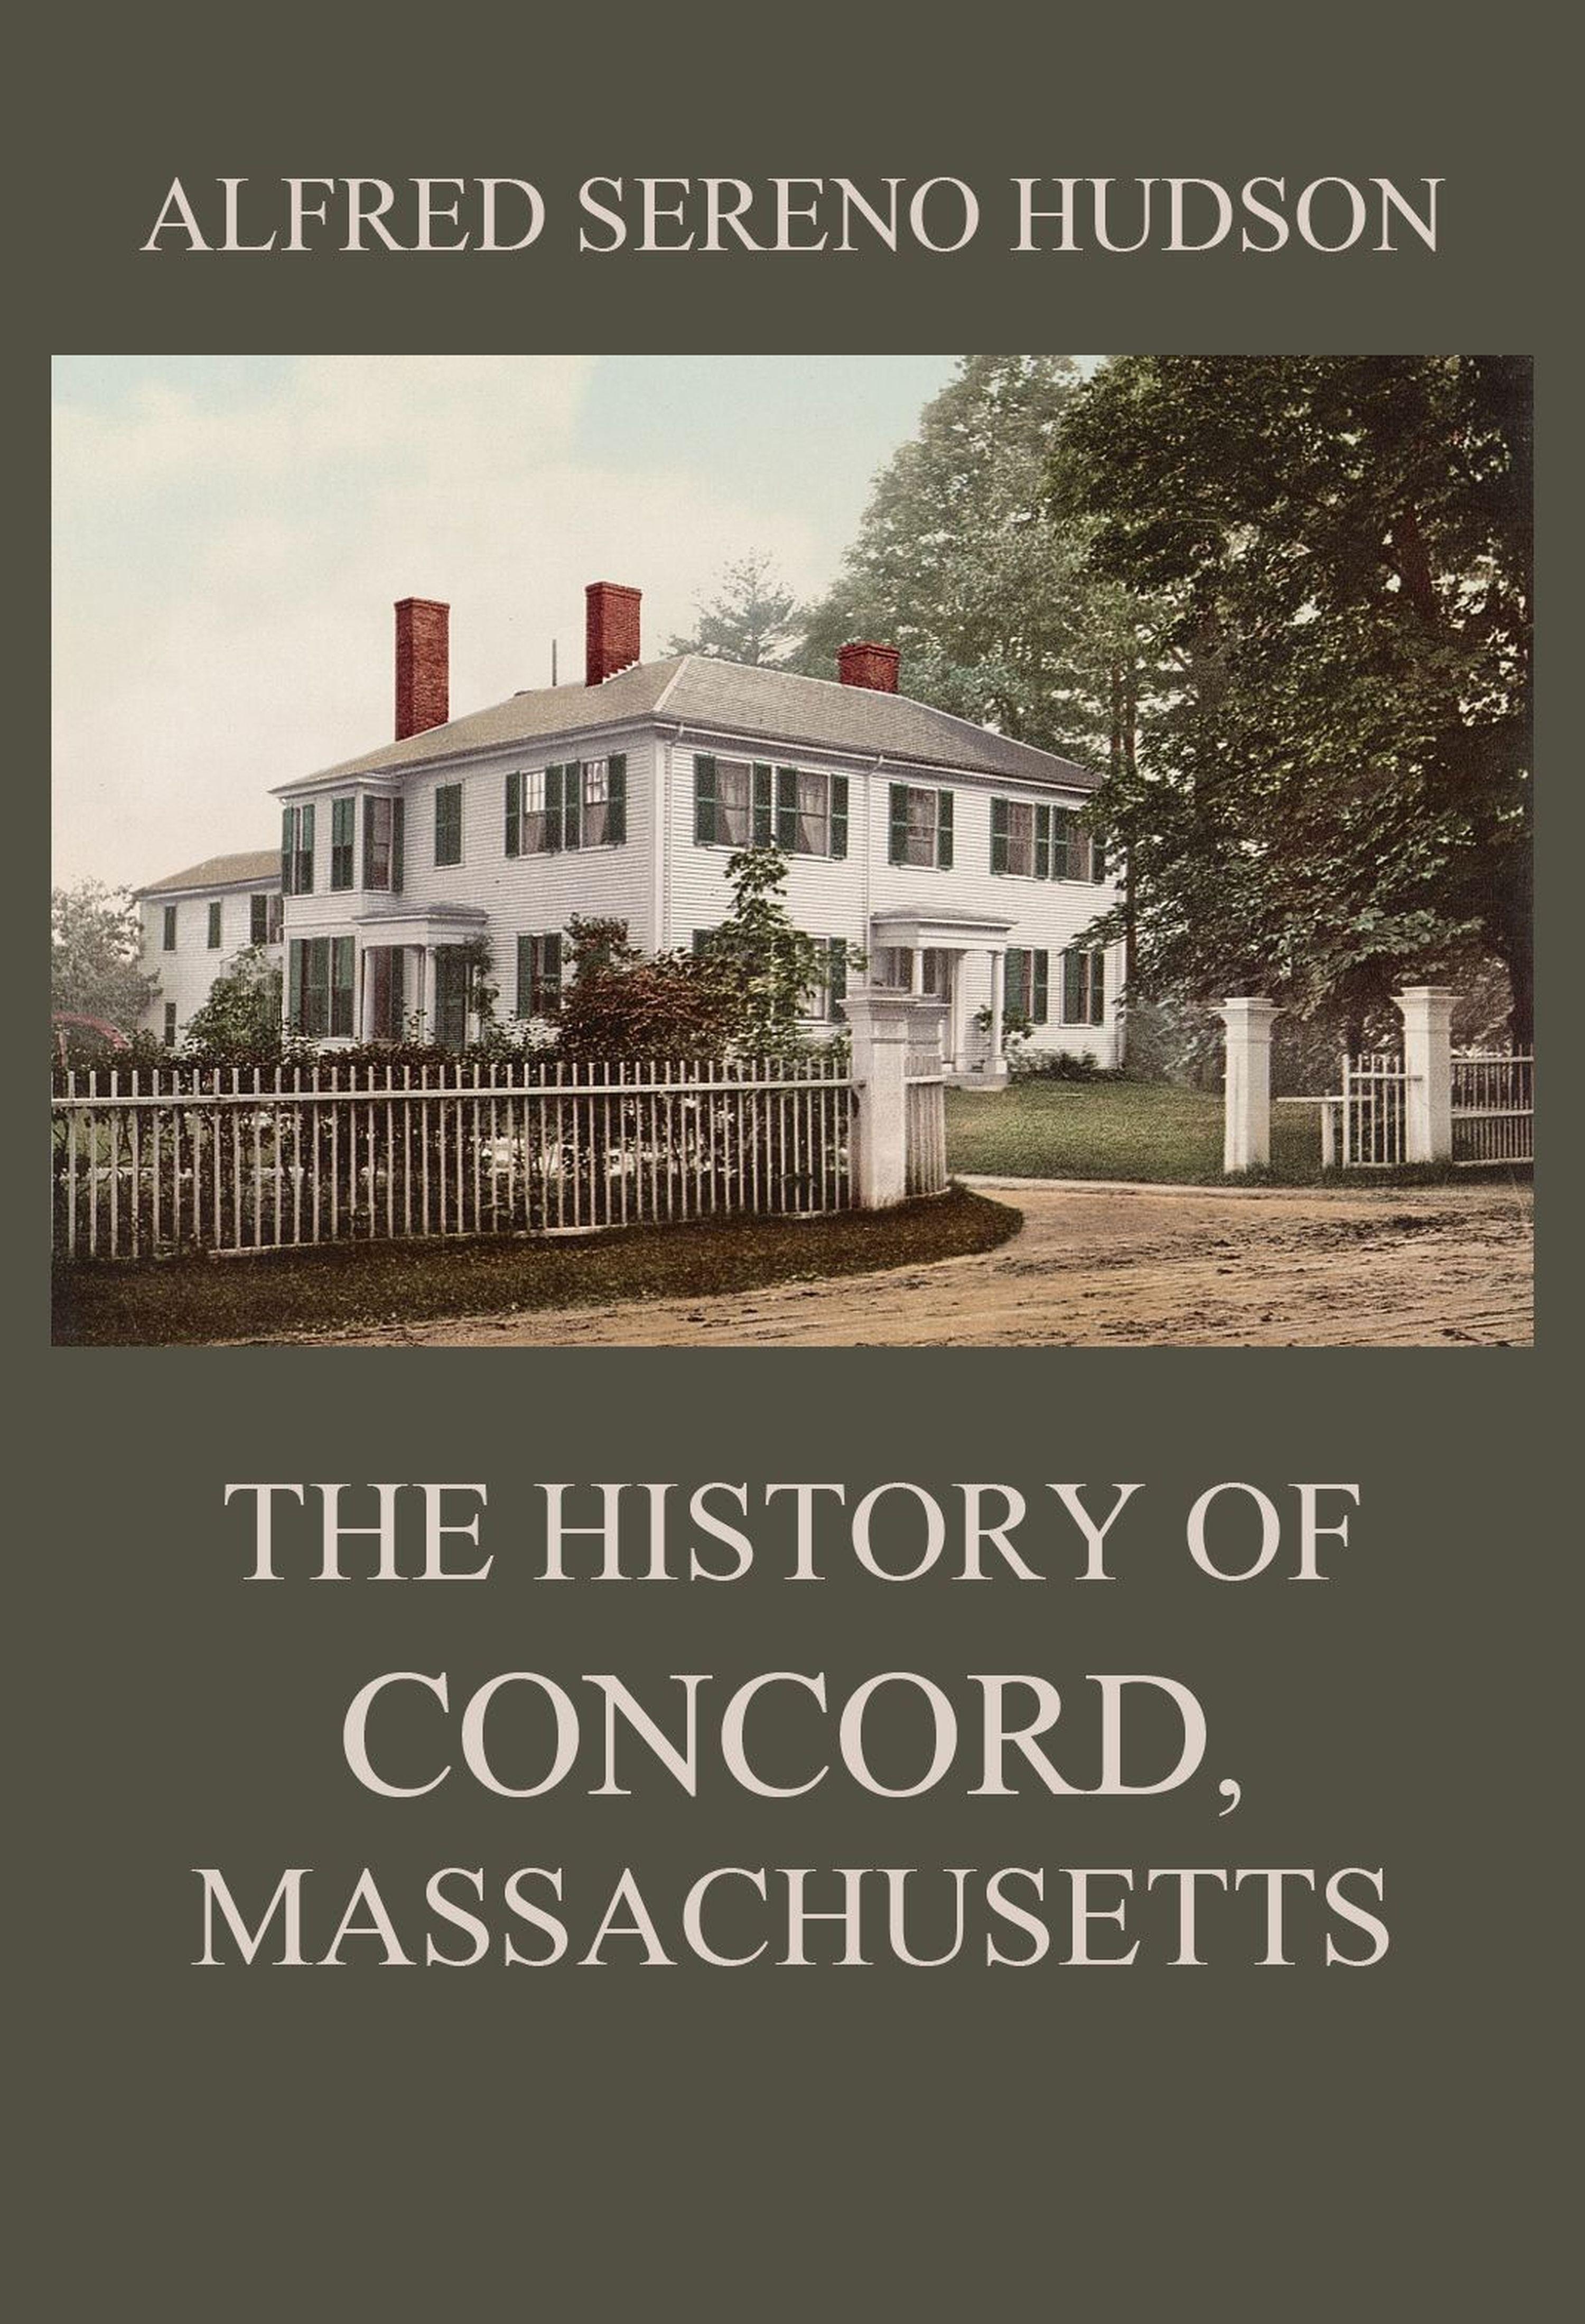 Alfred Sereno Hudson The History of Concord, Massachusetts the concord quartet